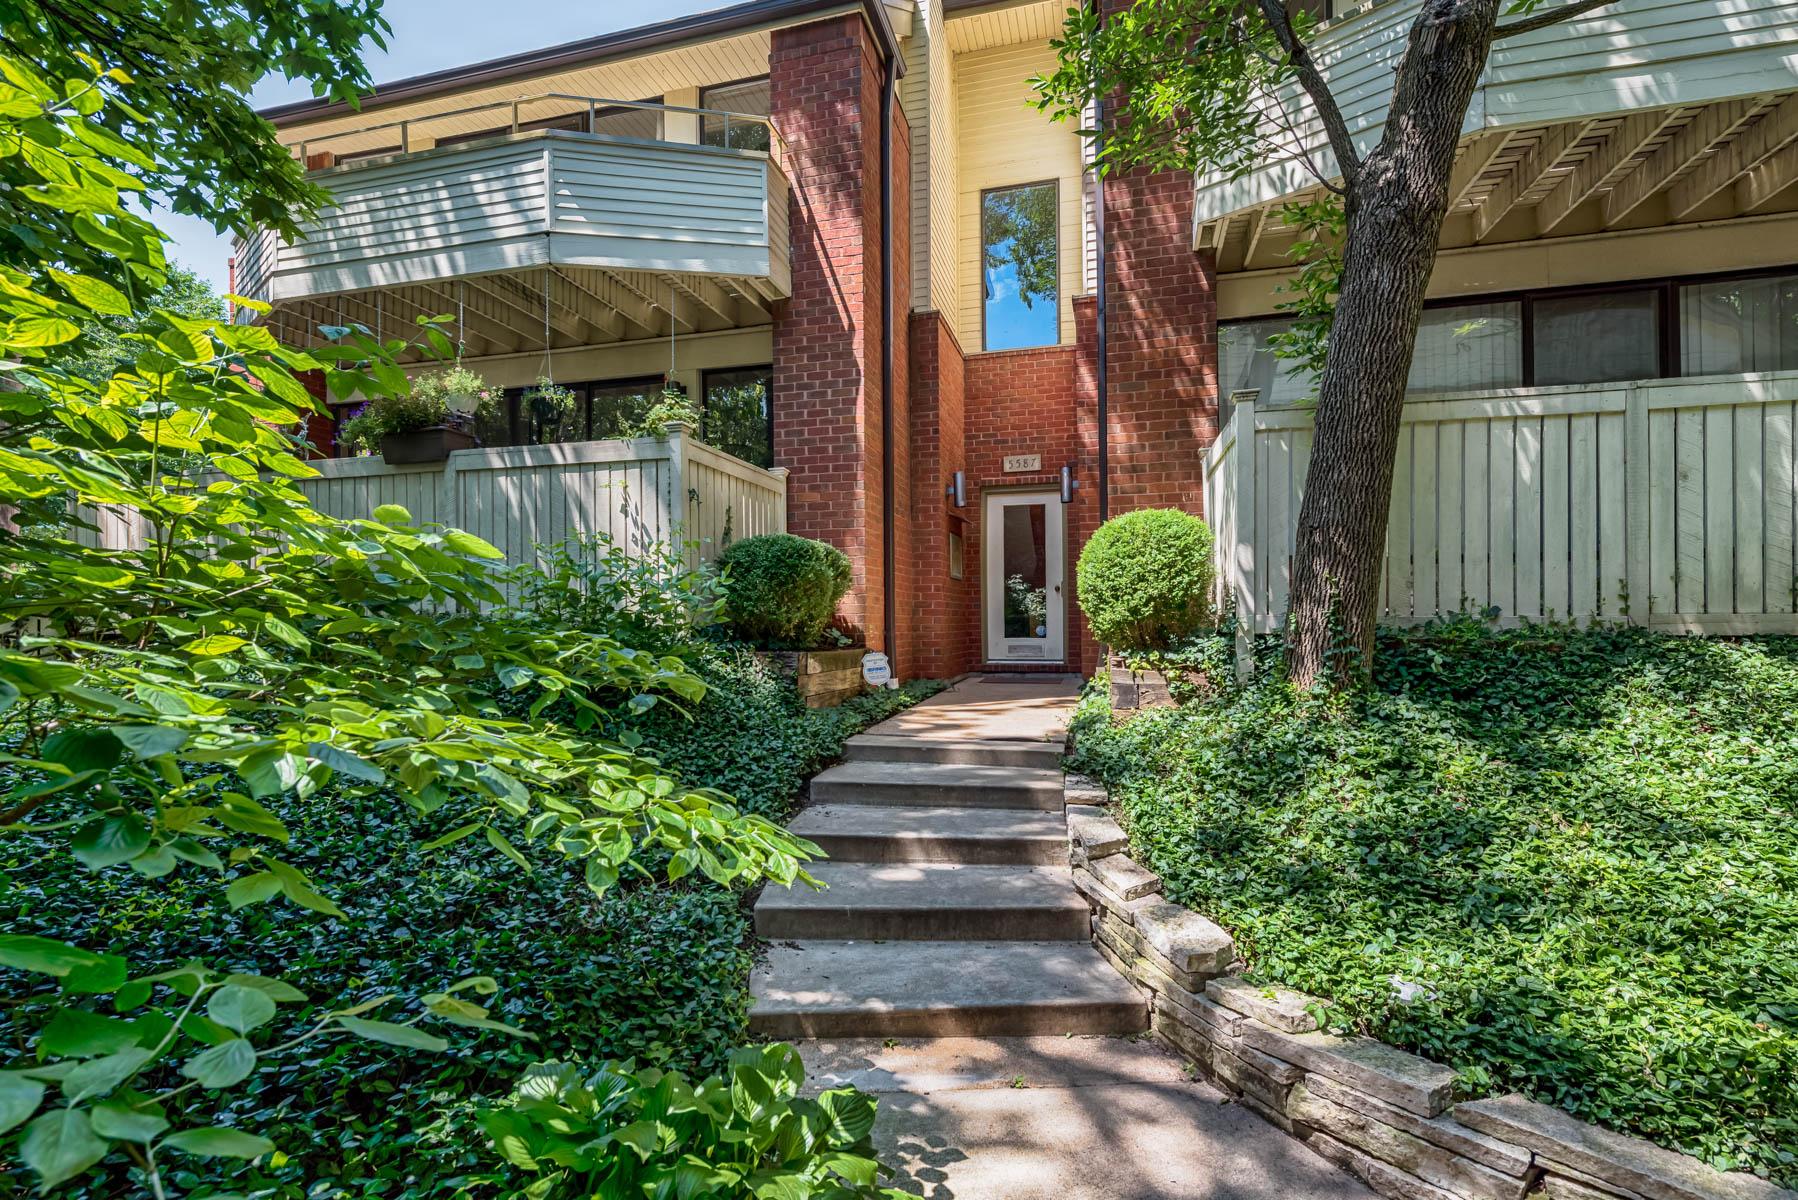 Condominium for Sale at Waterman Blvd #B 5587 Waterman Blvd #B St. Louis, Missouri 63112 United States